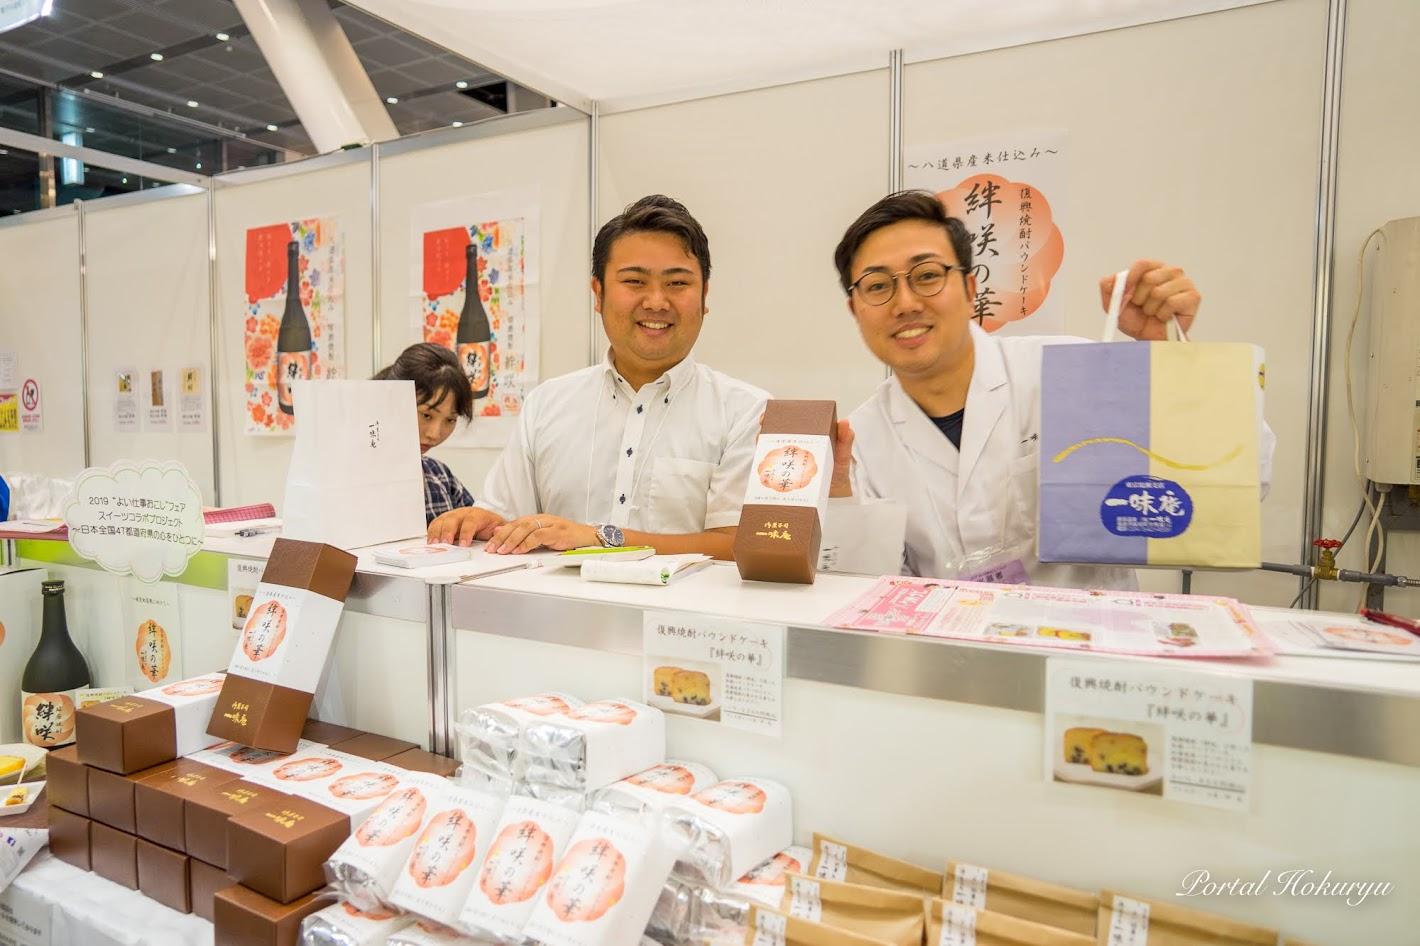 大正創業老舗菓子舗「一味庵」氏家一浩 専務(右)とスタッフ